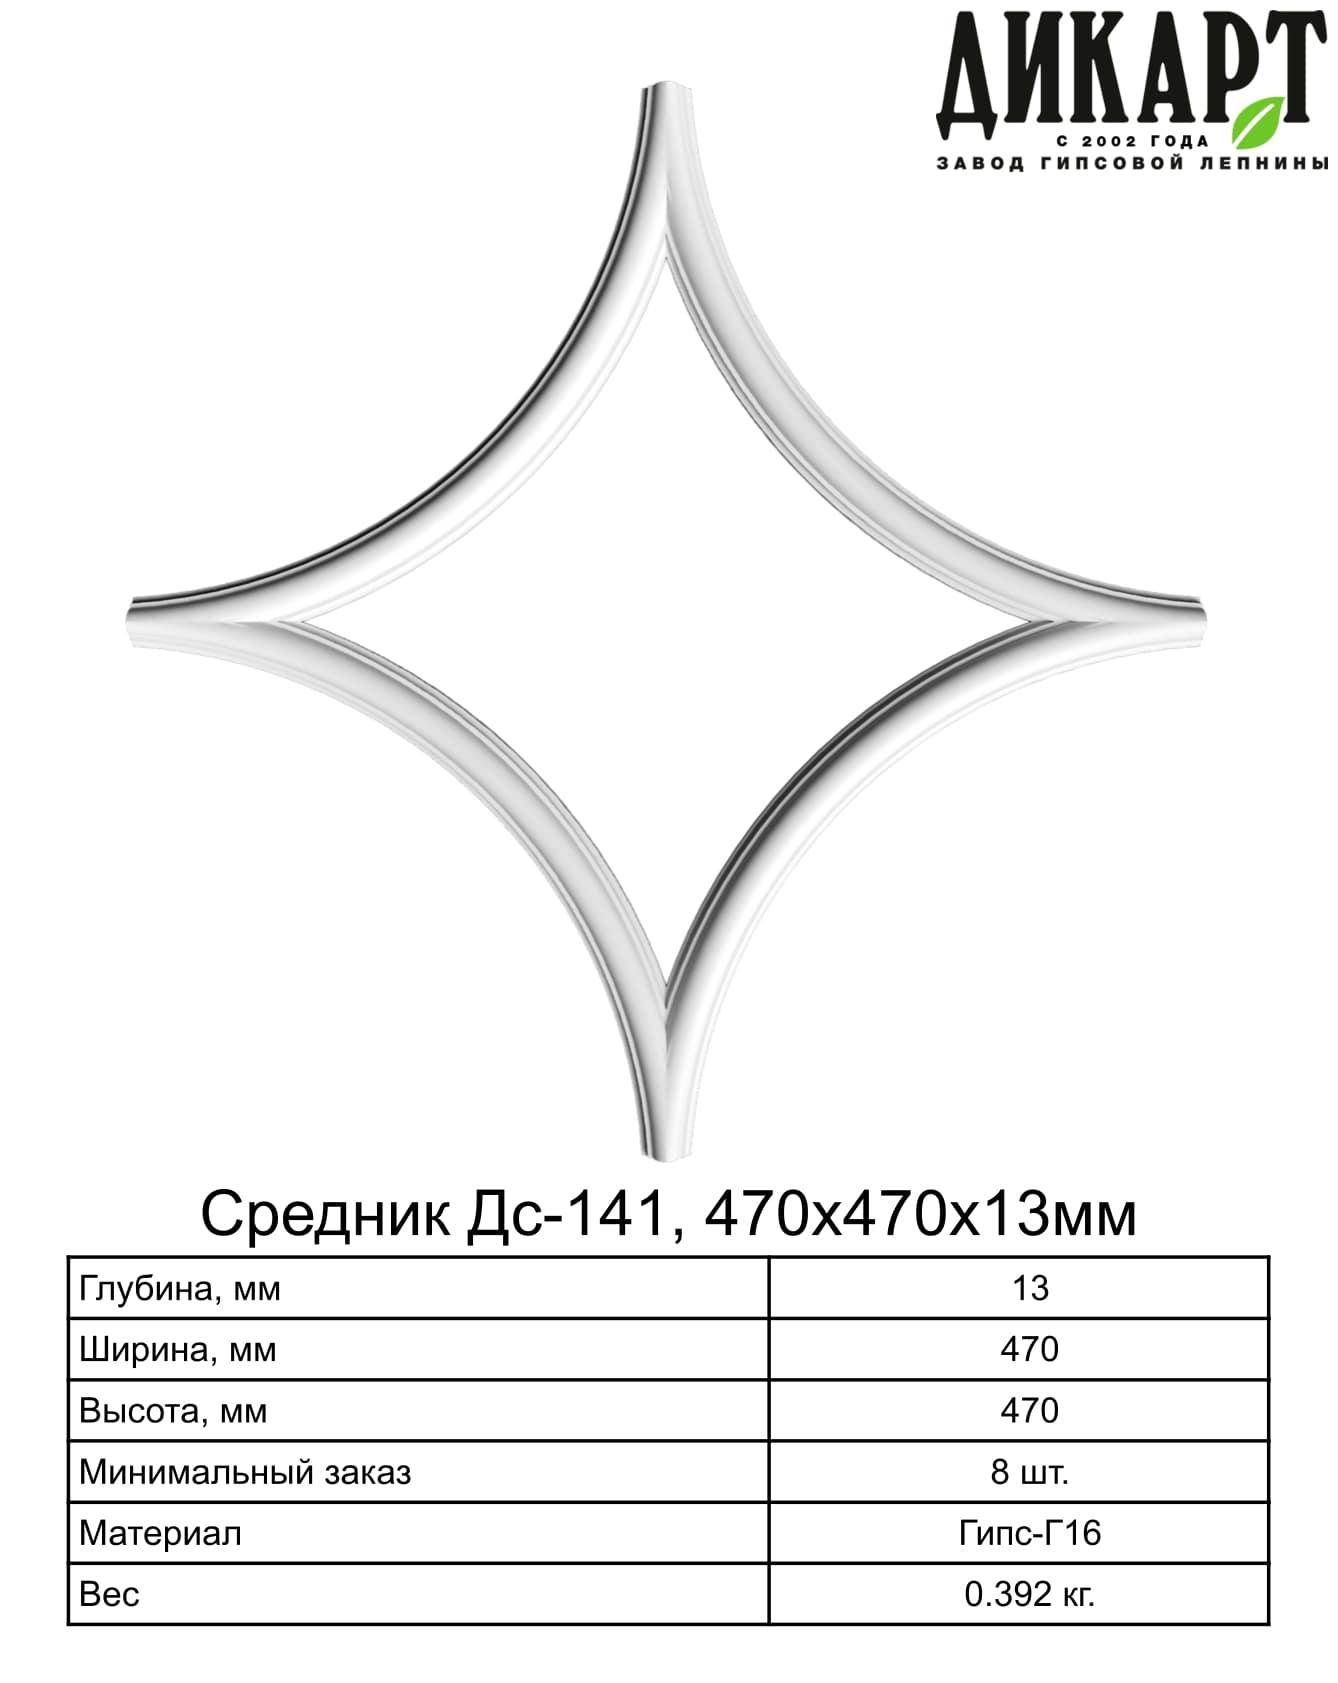 Средник_Дс-141